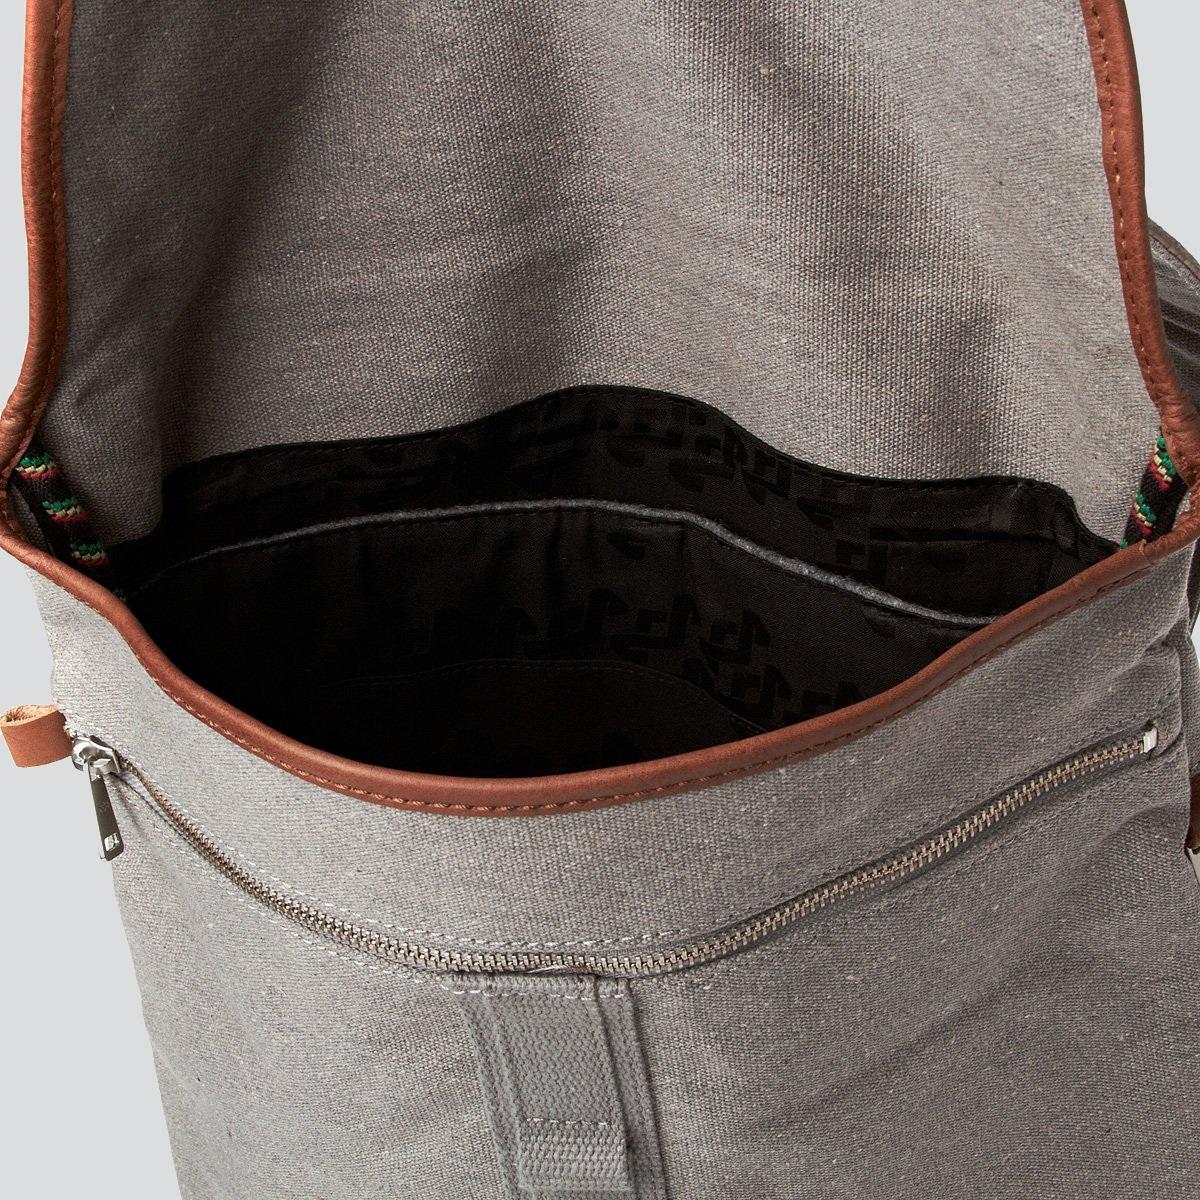 Small+Bag+Detail_Marley.jpg